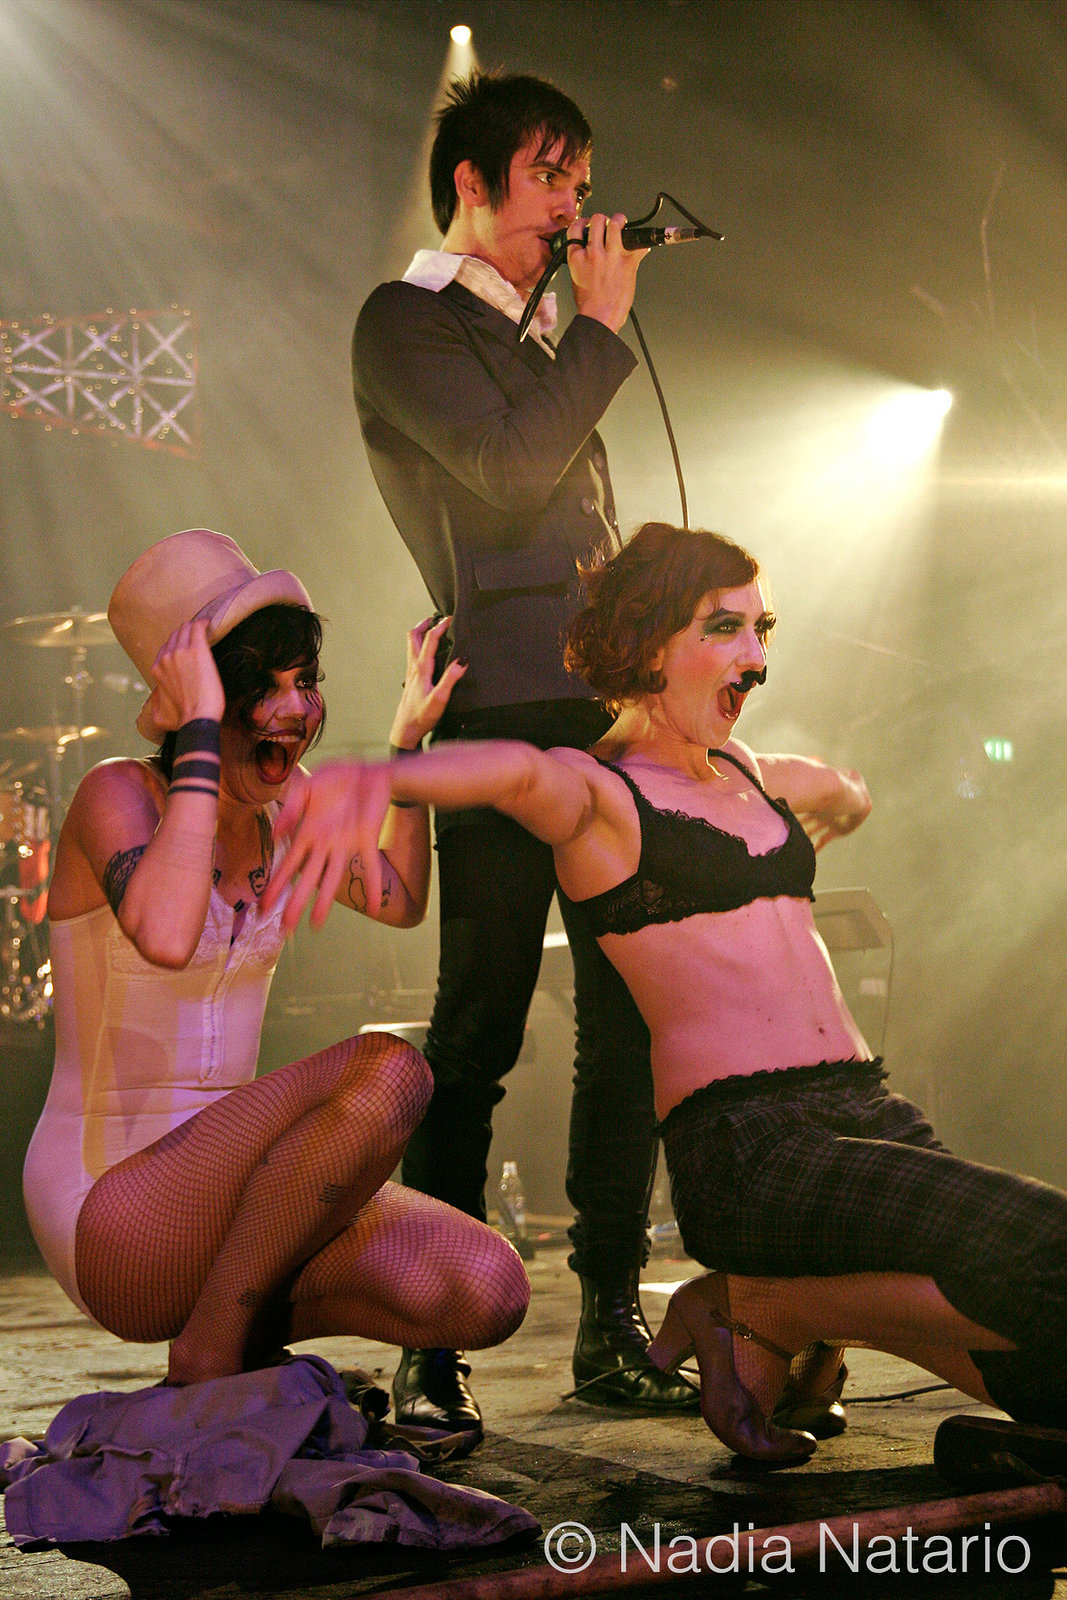 Panic! At The Disco at Brixton Academy